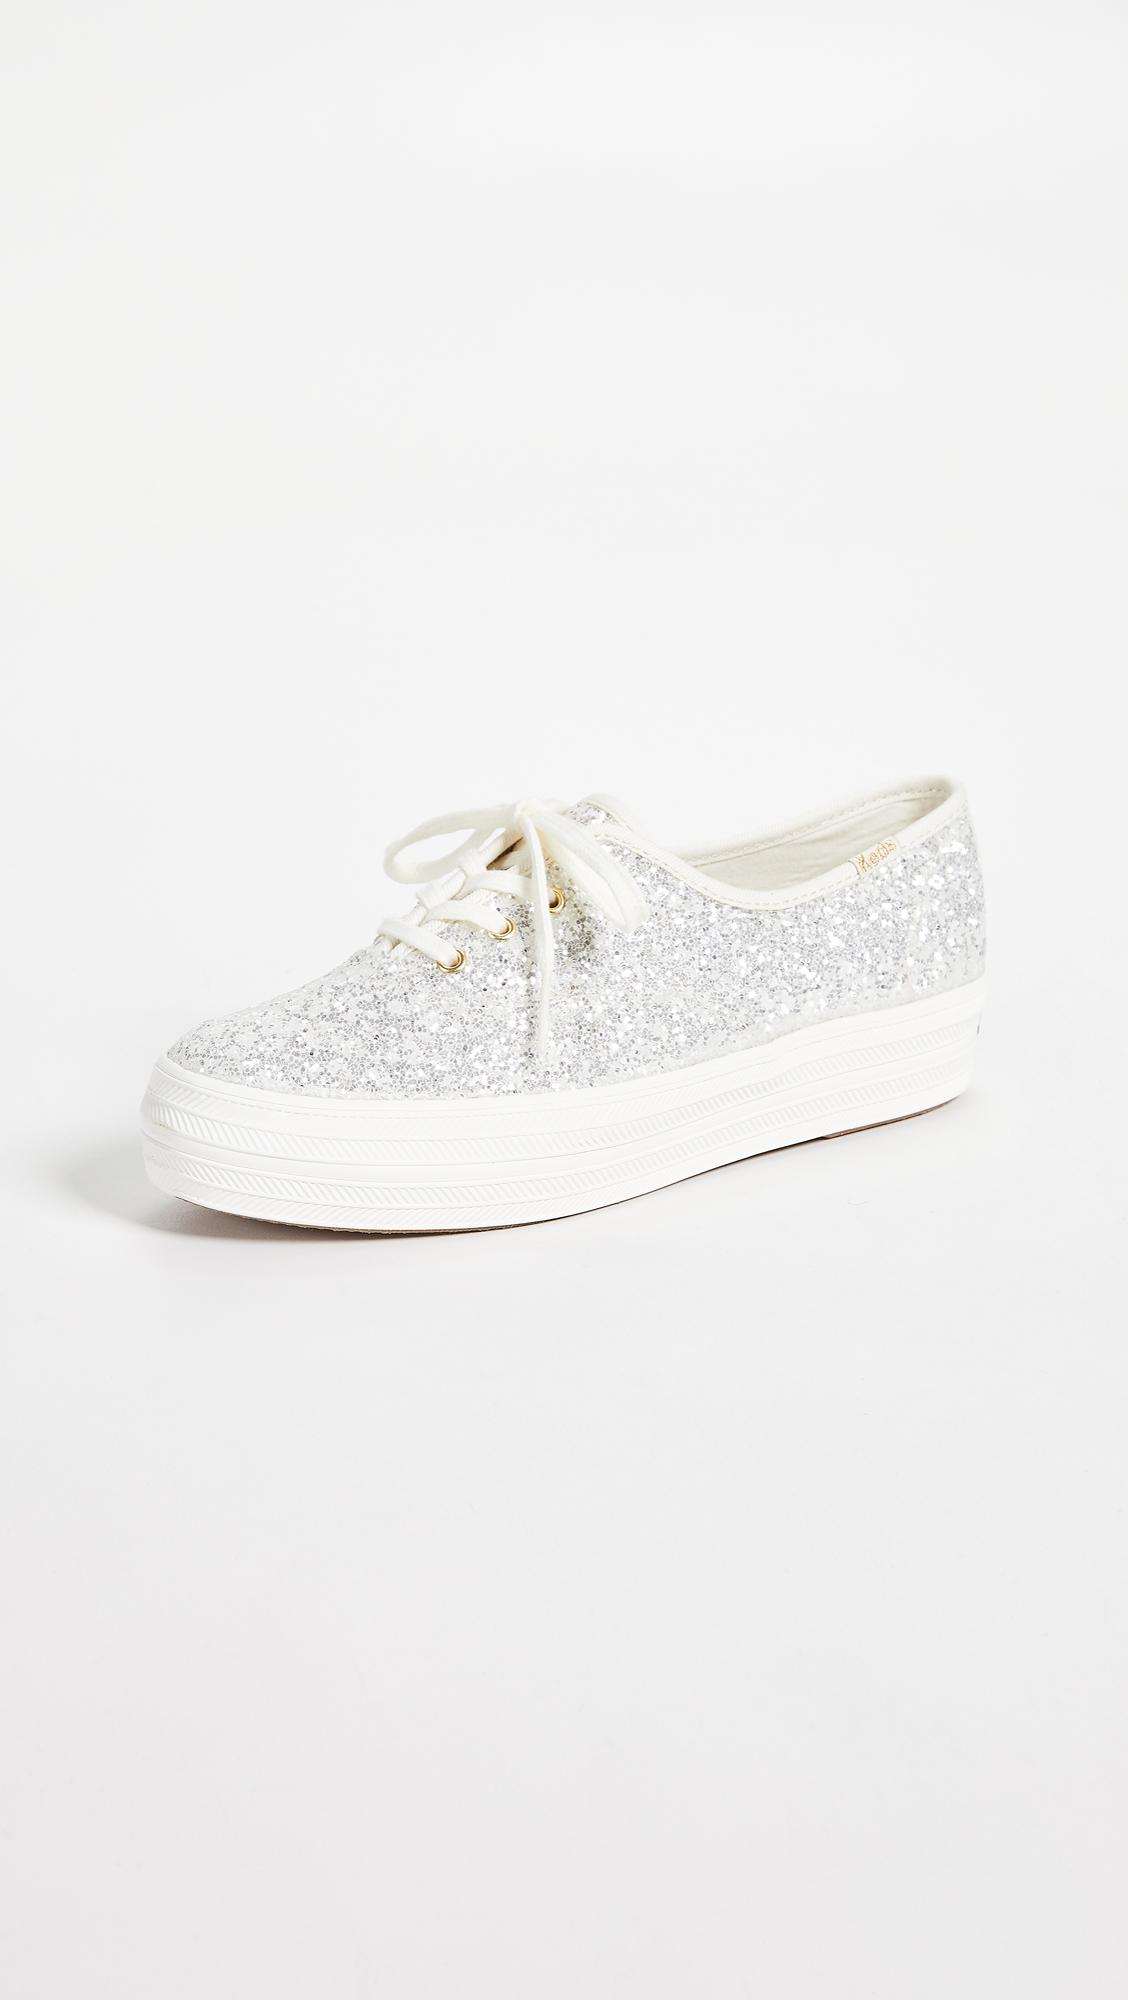 631f088db763b Keds x Kate Spade New York Triple Sneakers